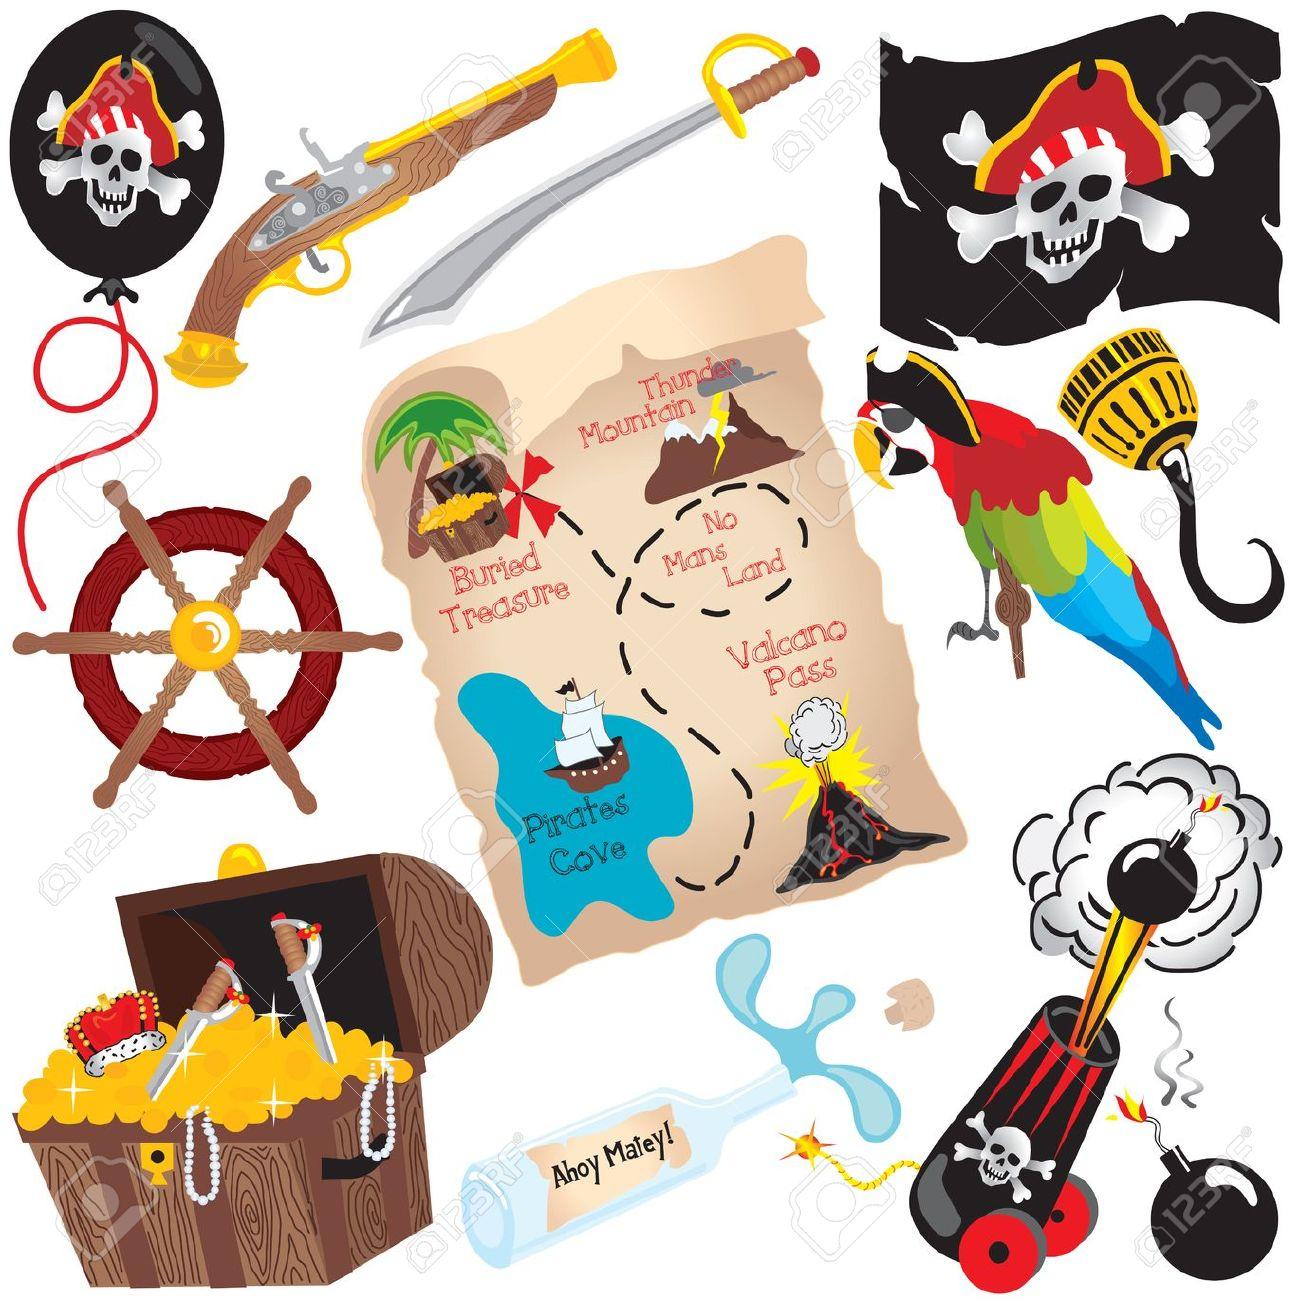 Treasure map symbols clip art dfiles.